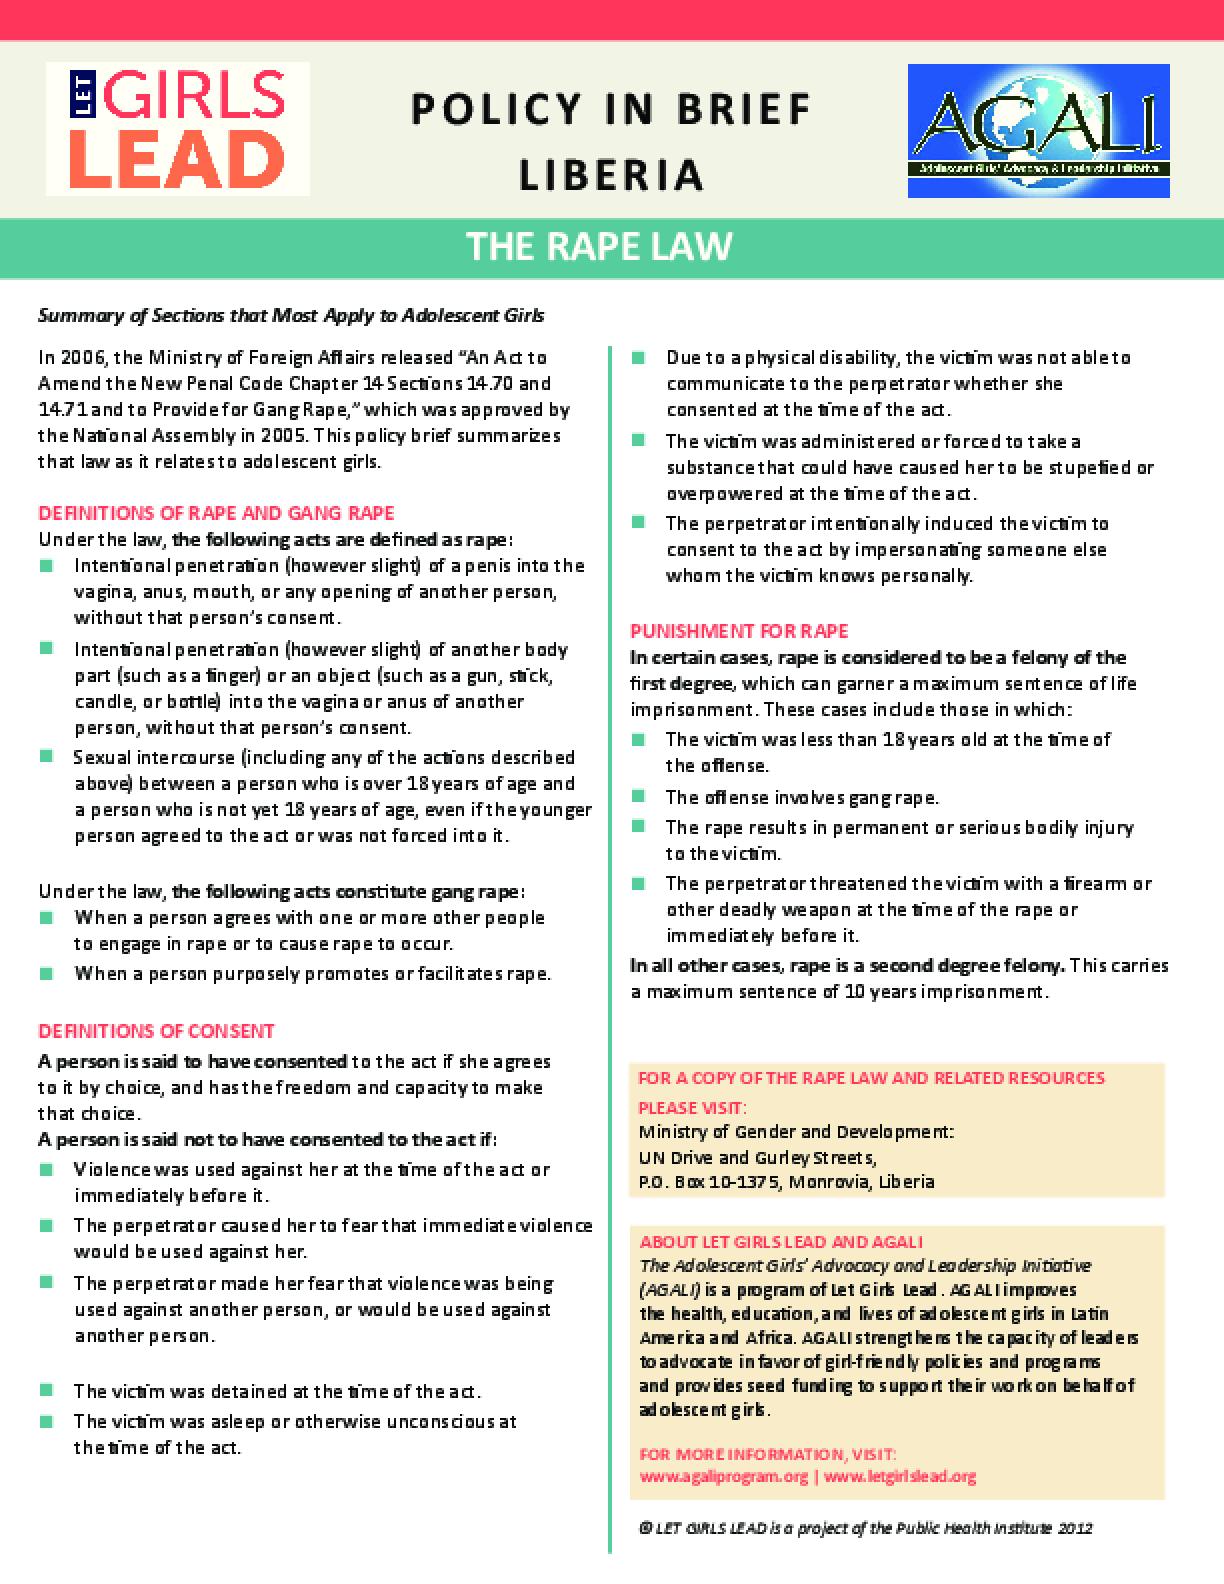 Liberia Rape Law